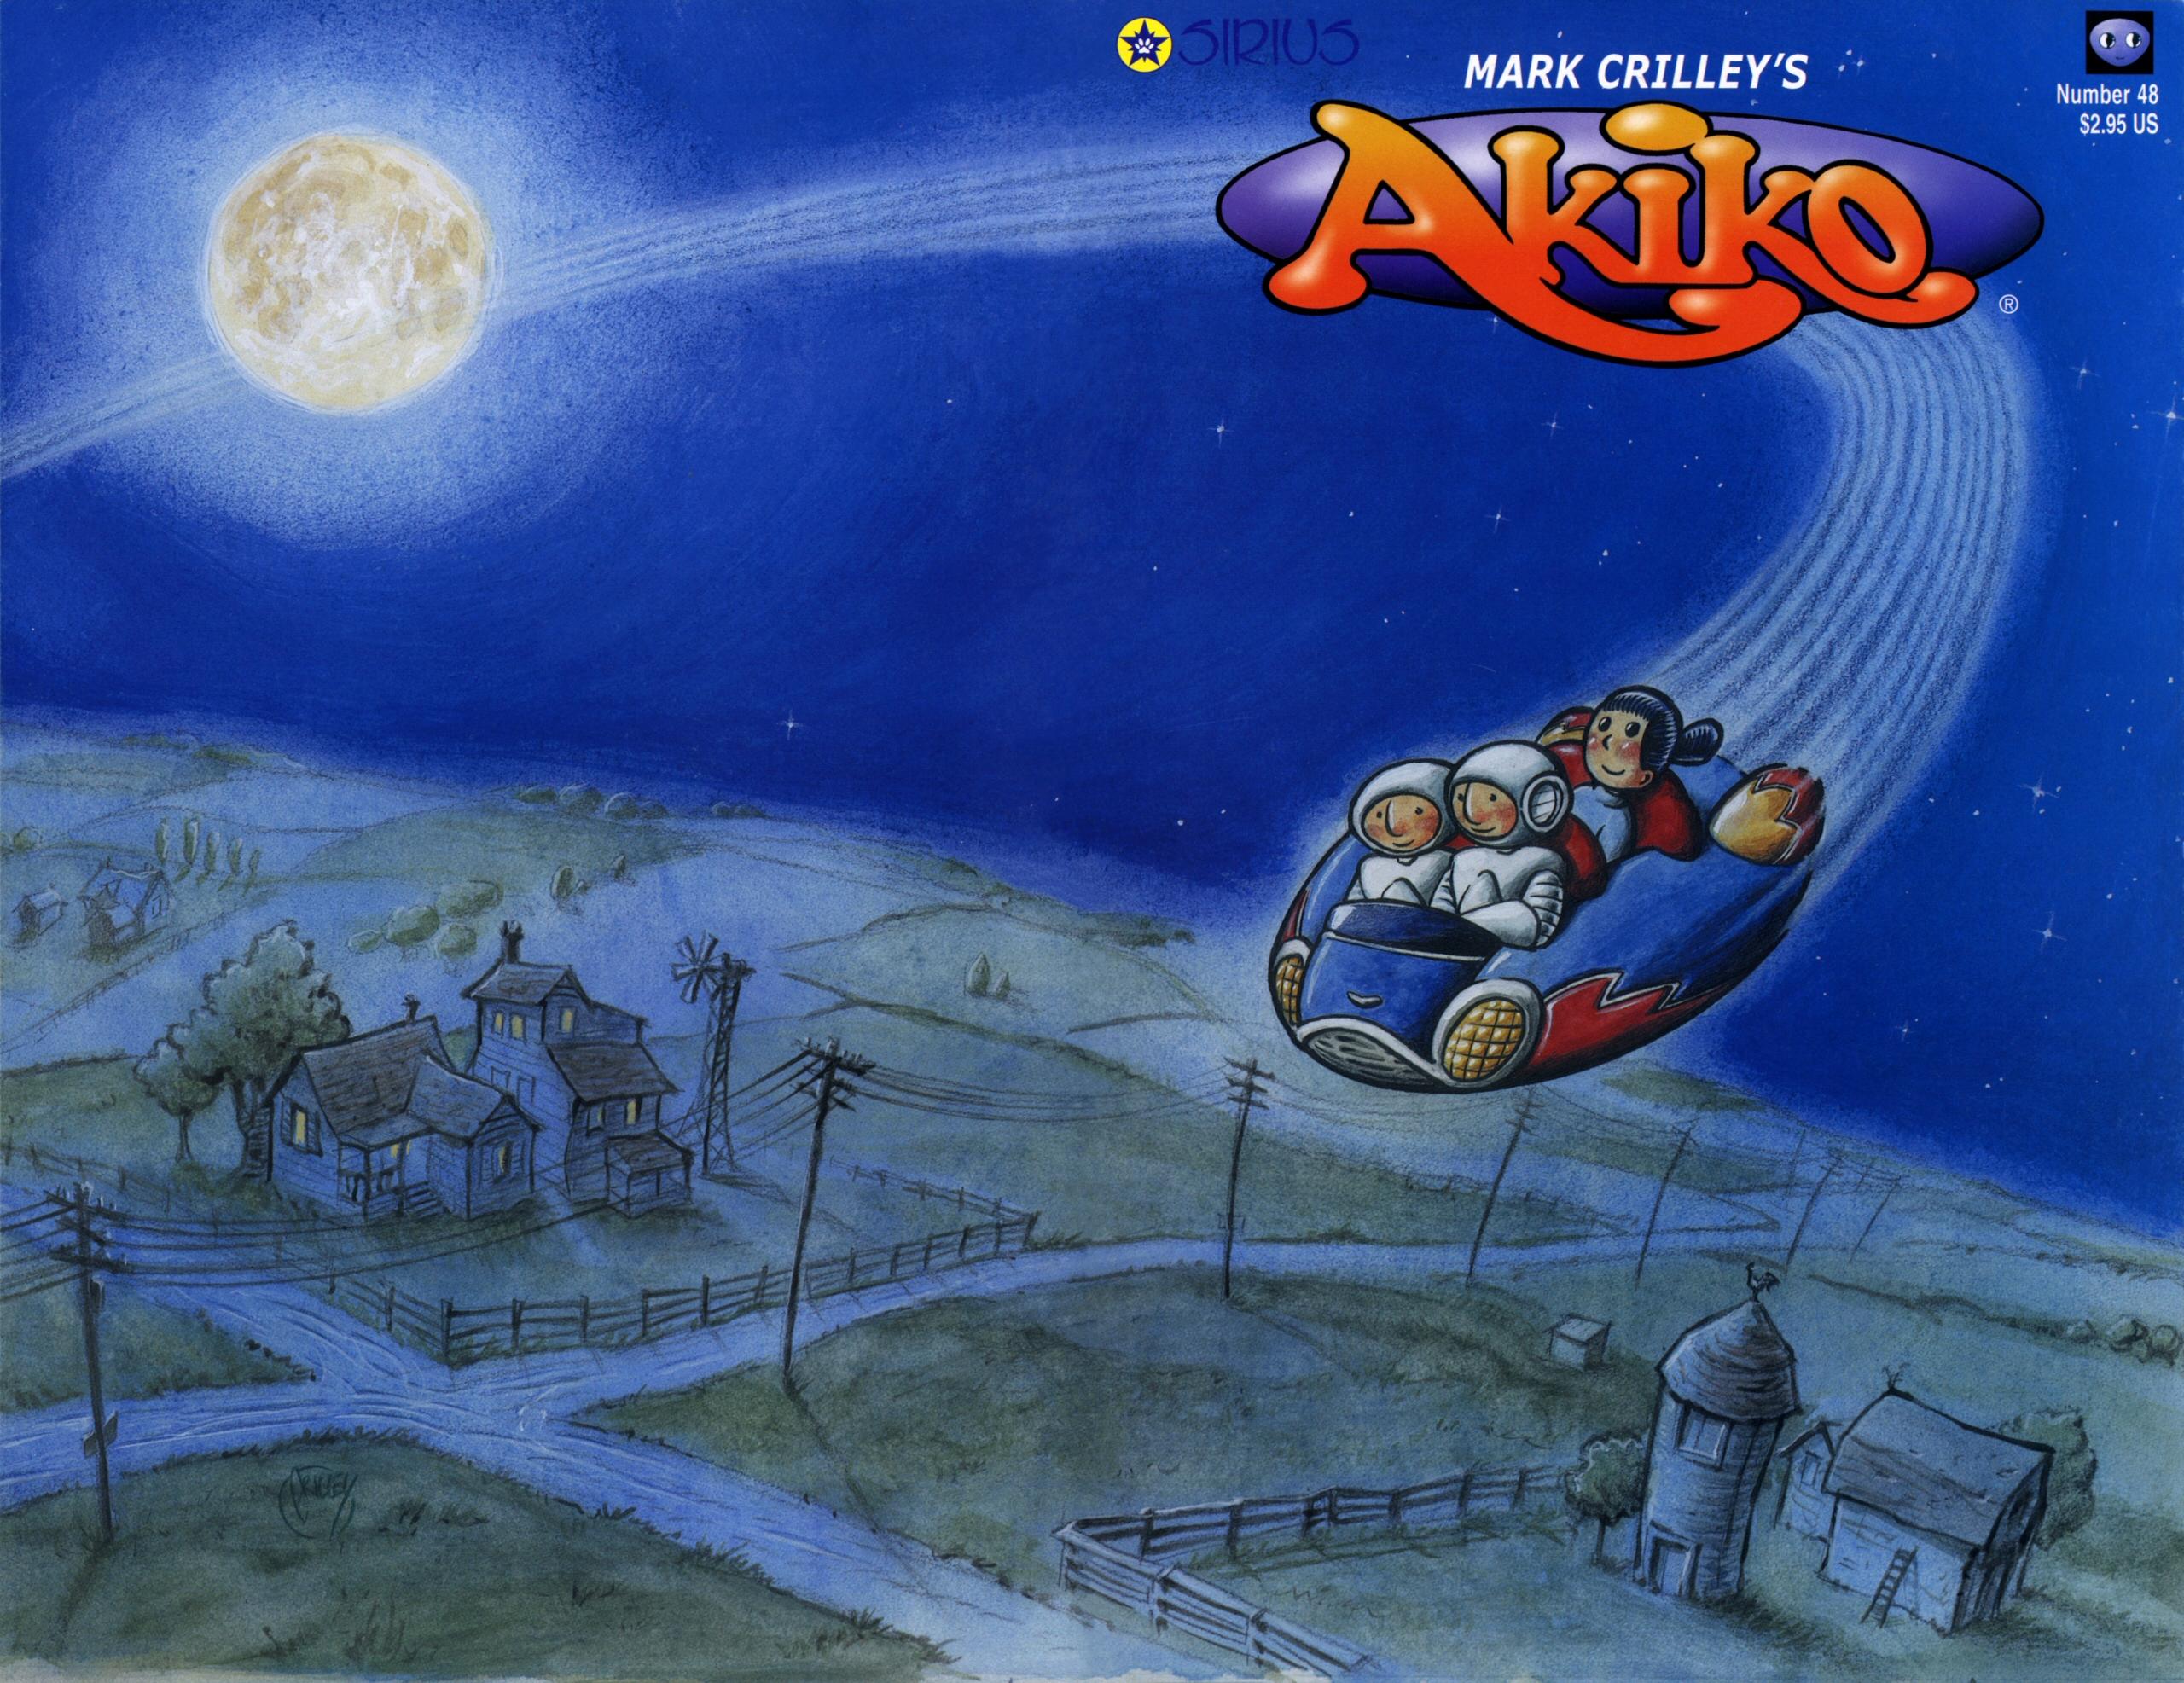 Read online Akiko comic -  Issue #48 - 1